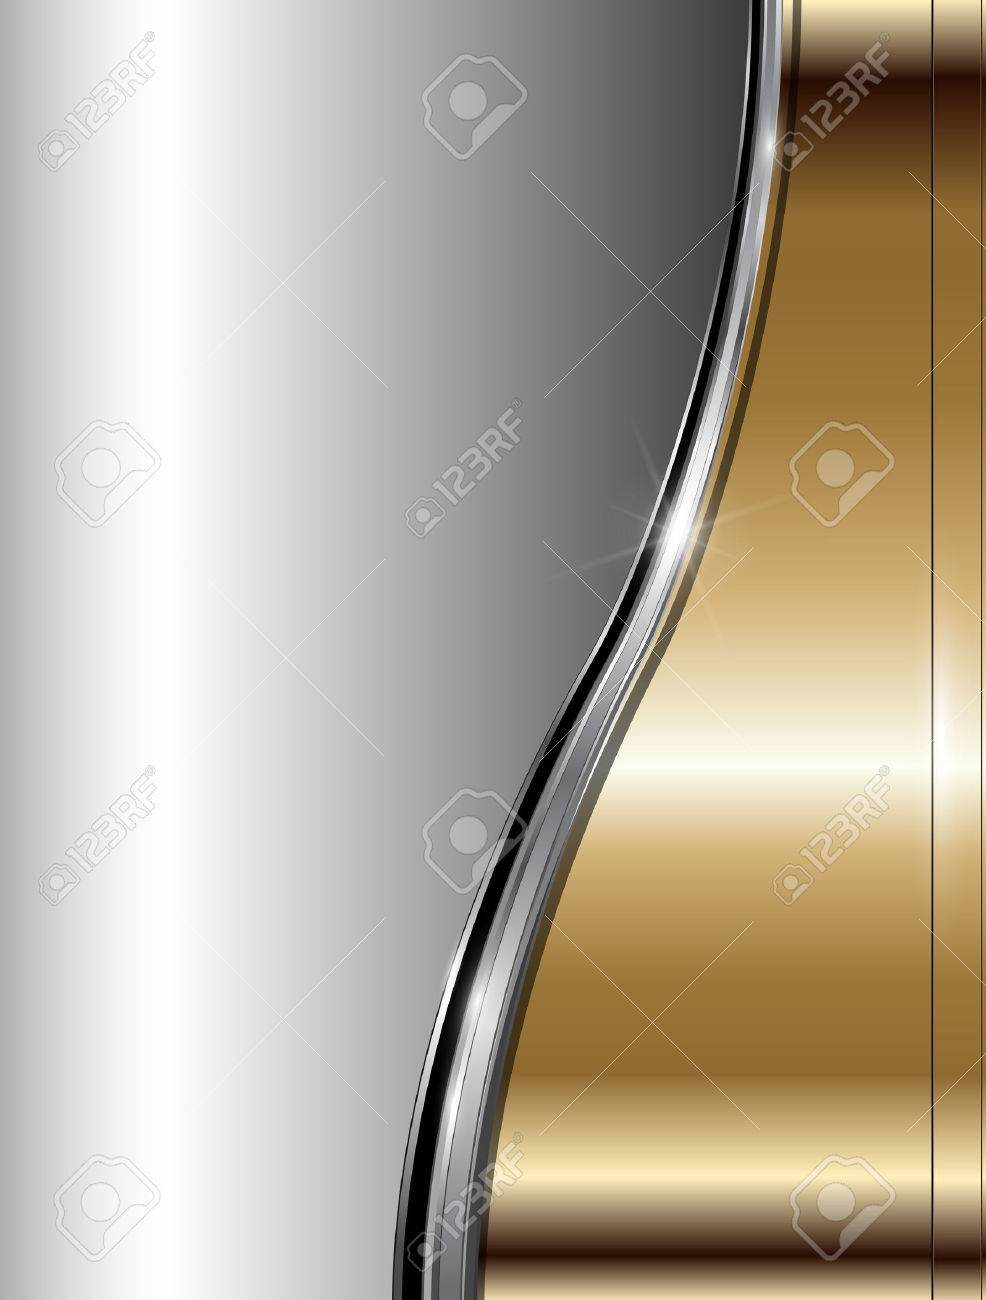 Abstract business background luxury gold metallic, vector. Stock Vector - 8783479